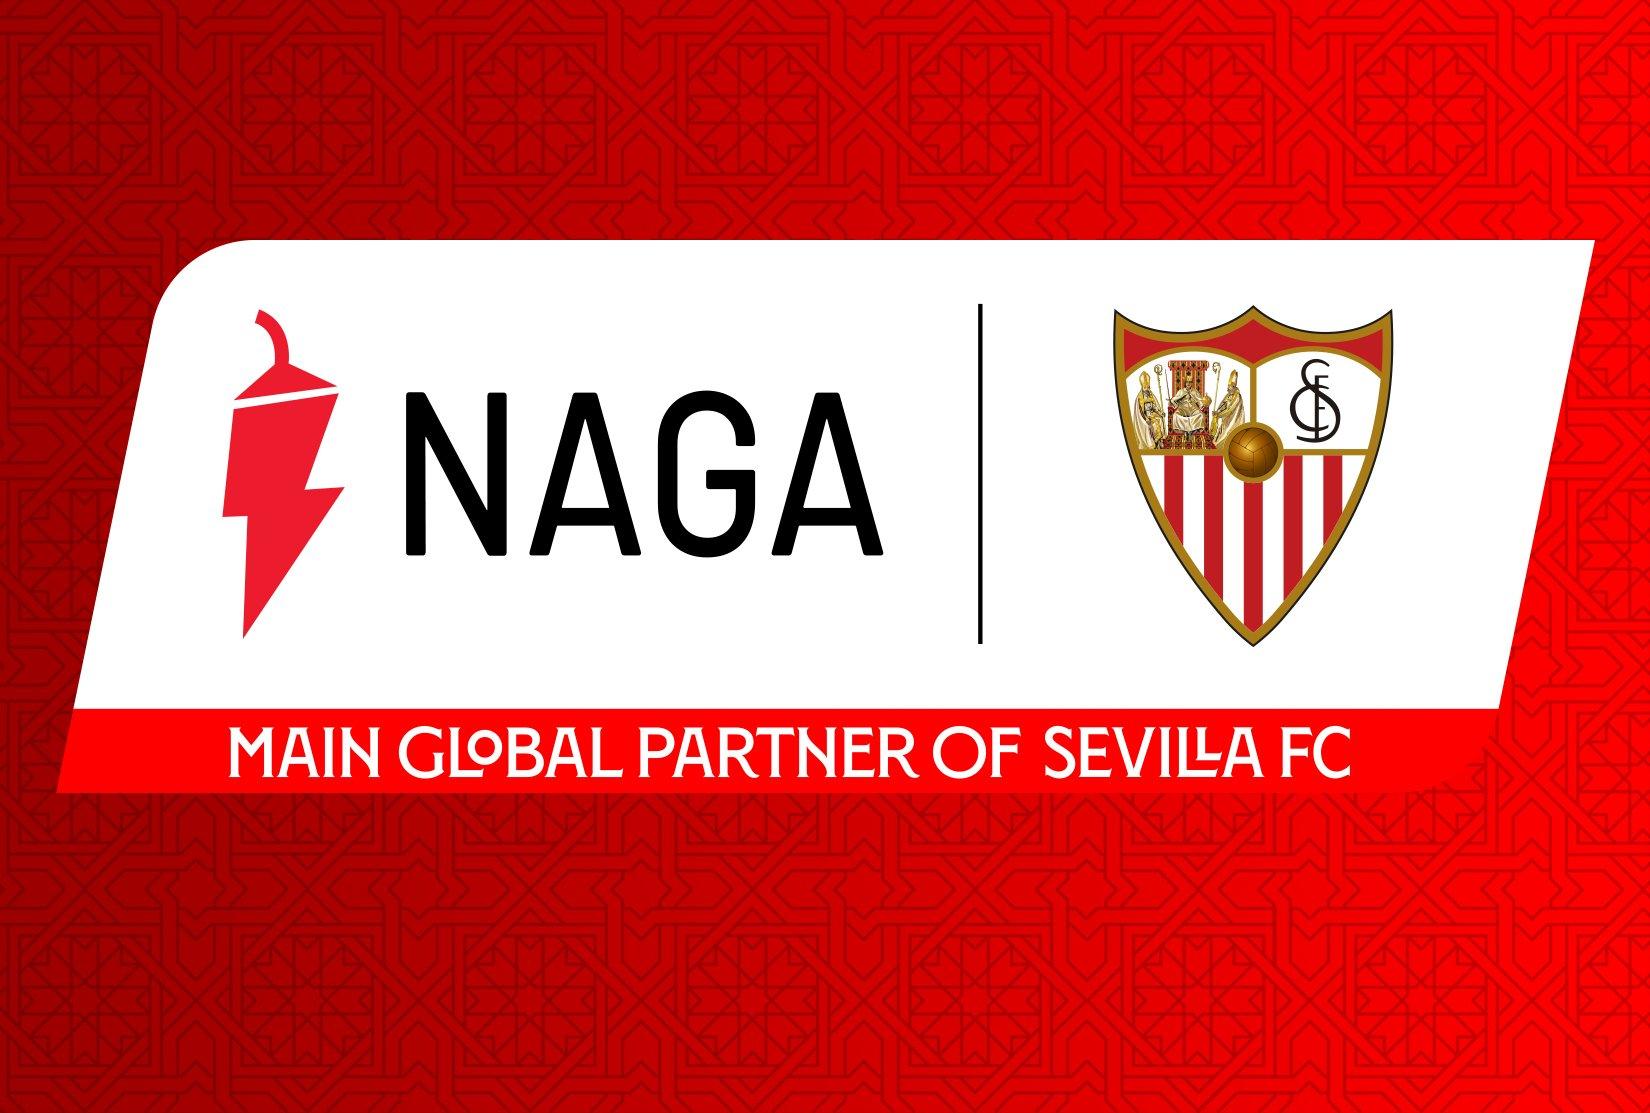 Naga & Sevilla FC join forces in a main global partnership